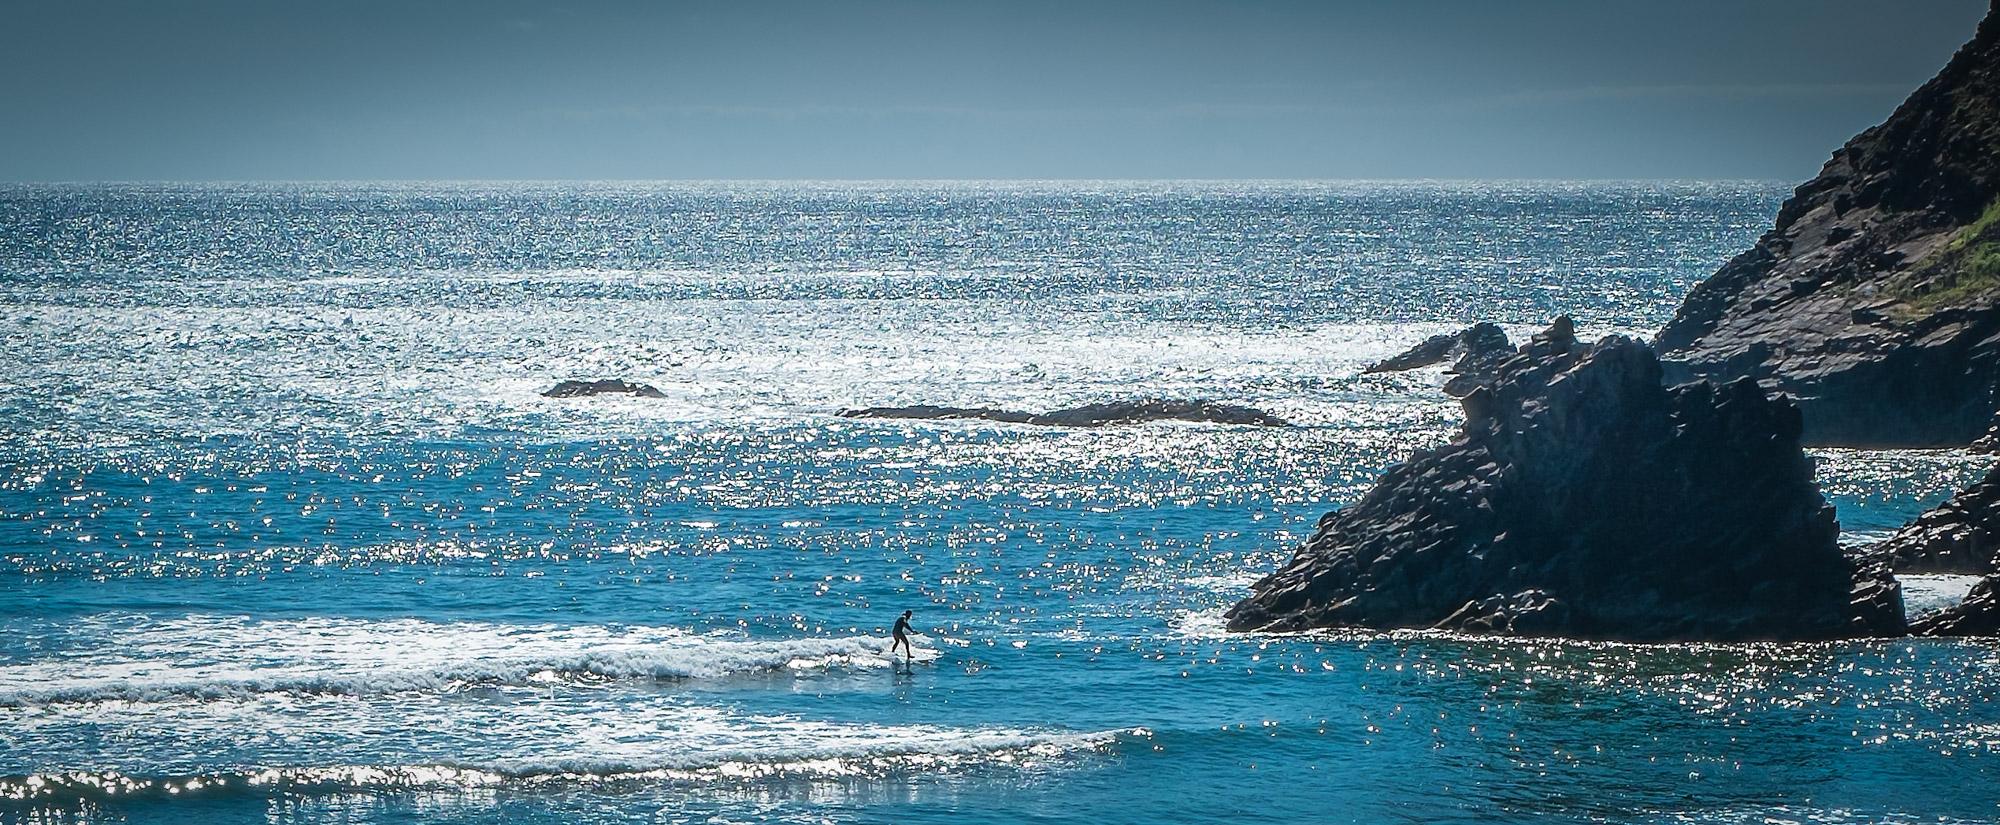 sm_oregon-coast-surfer-20130711-DSCF0692-Edit-2.jpg